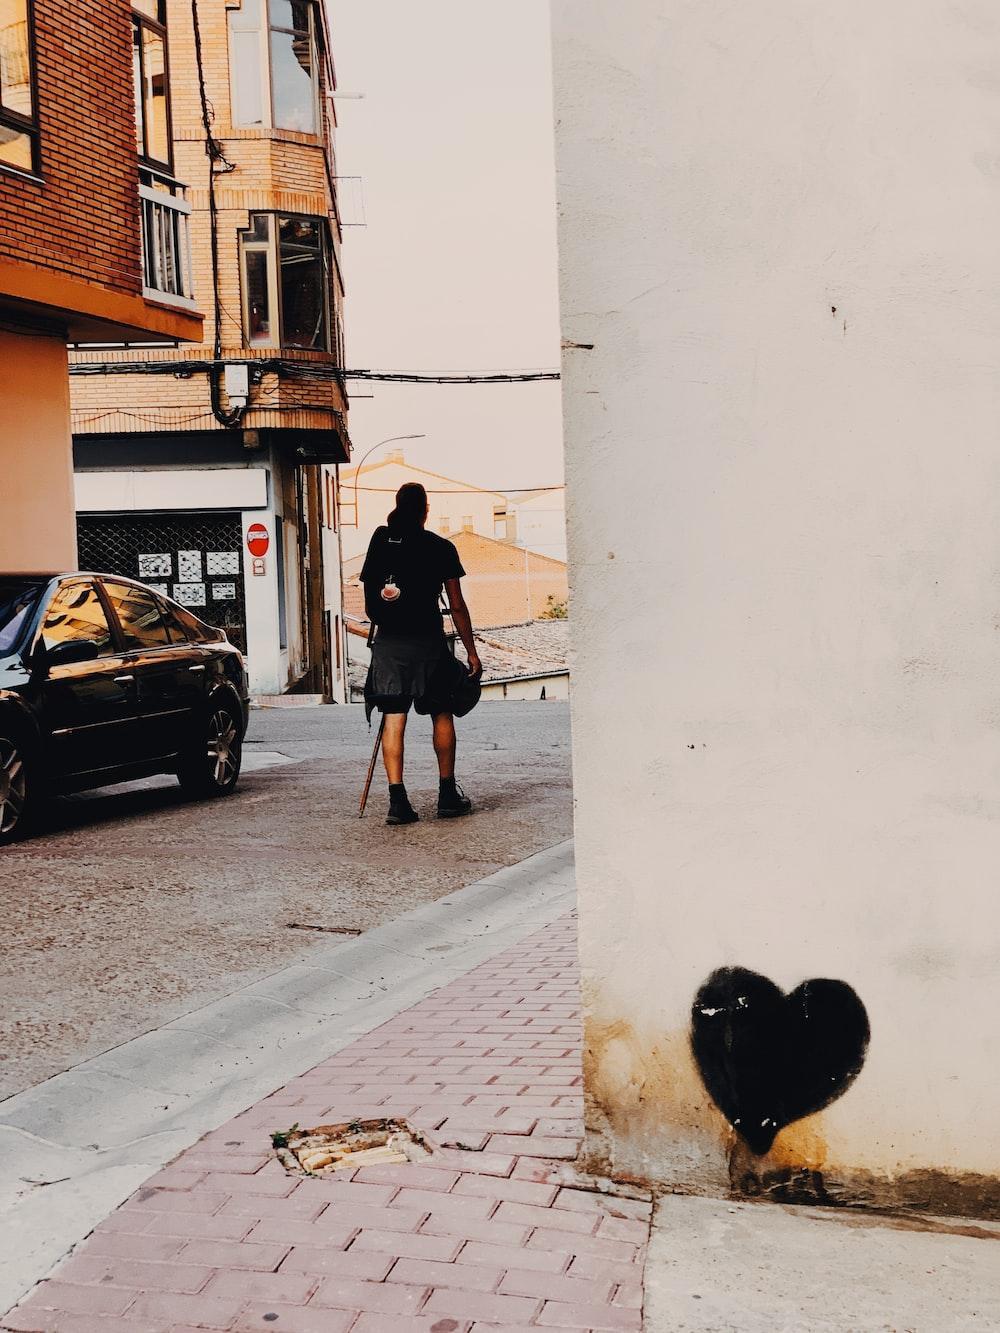 man walking on road passes by black car during daytime